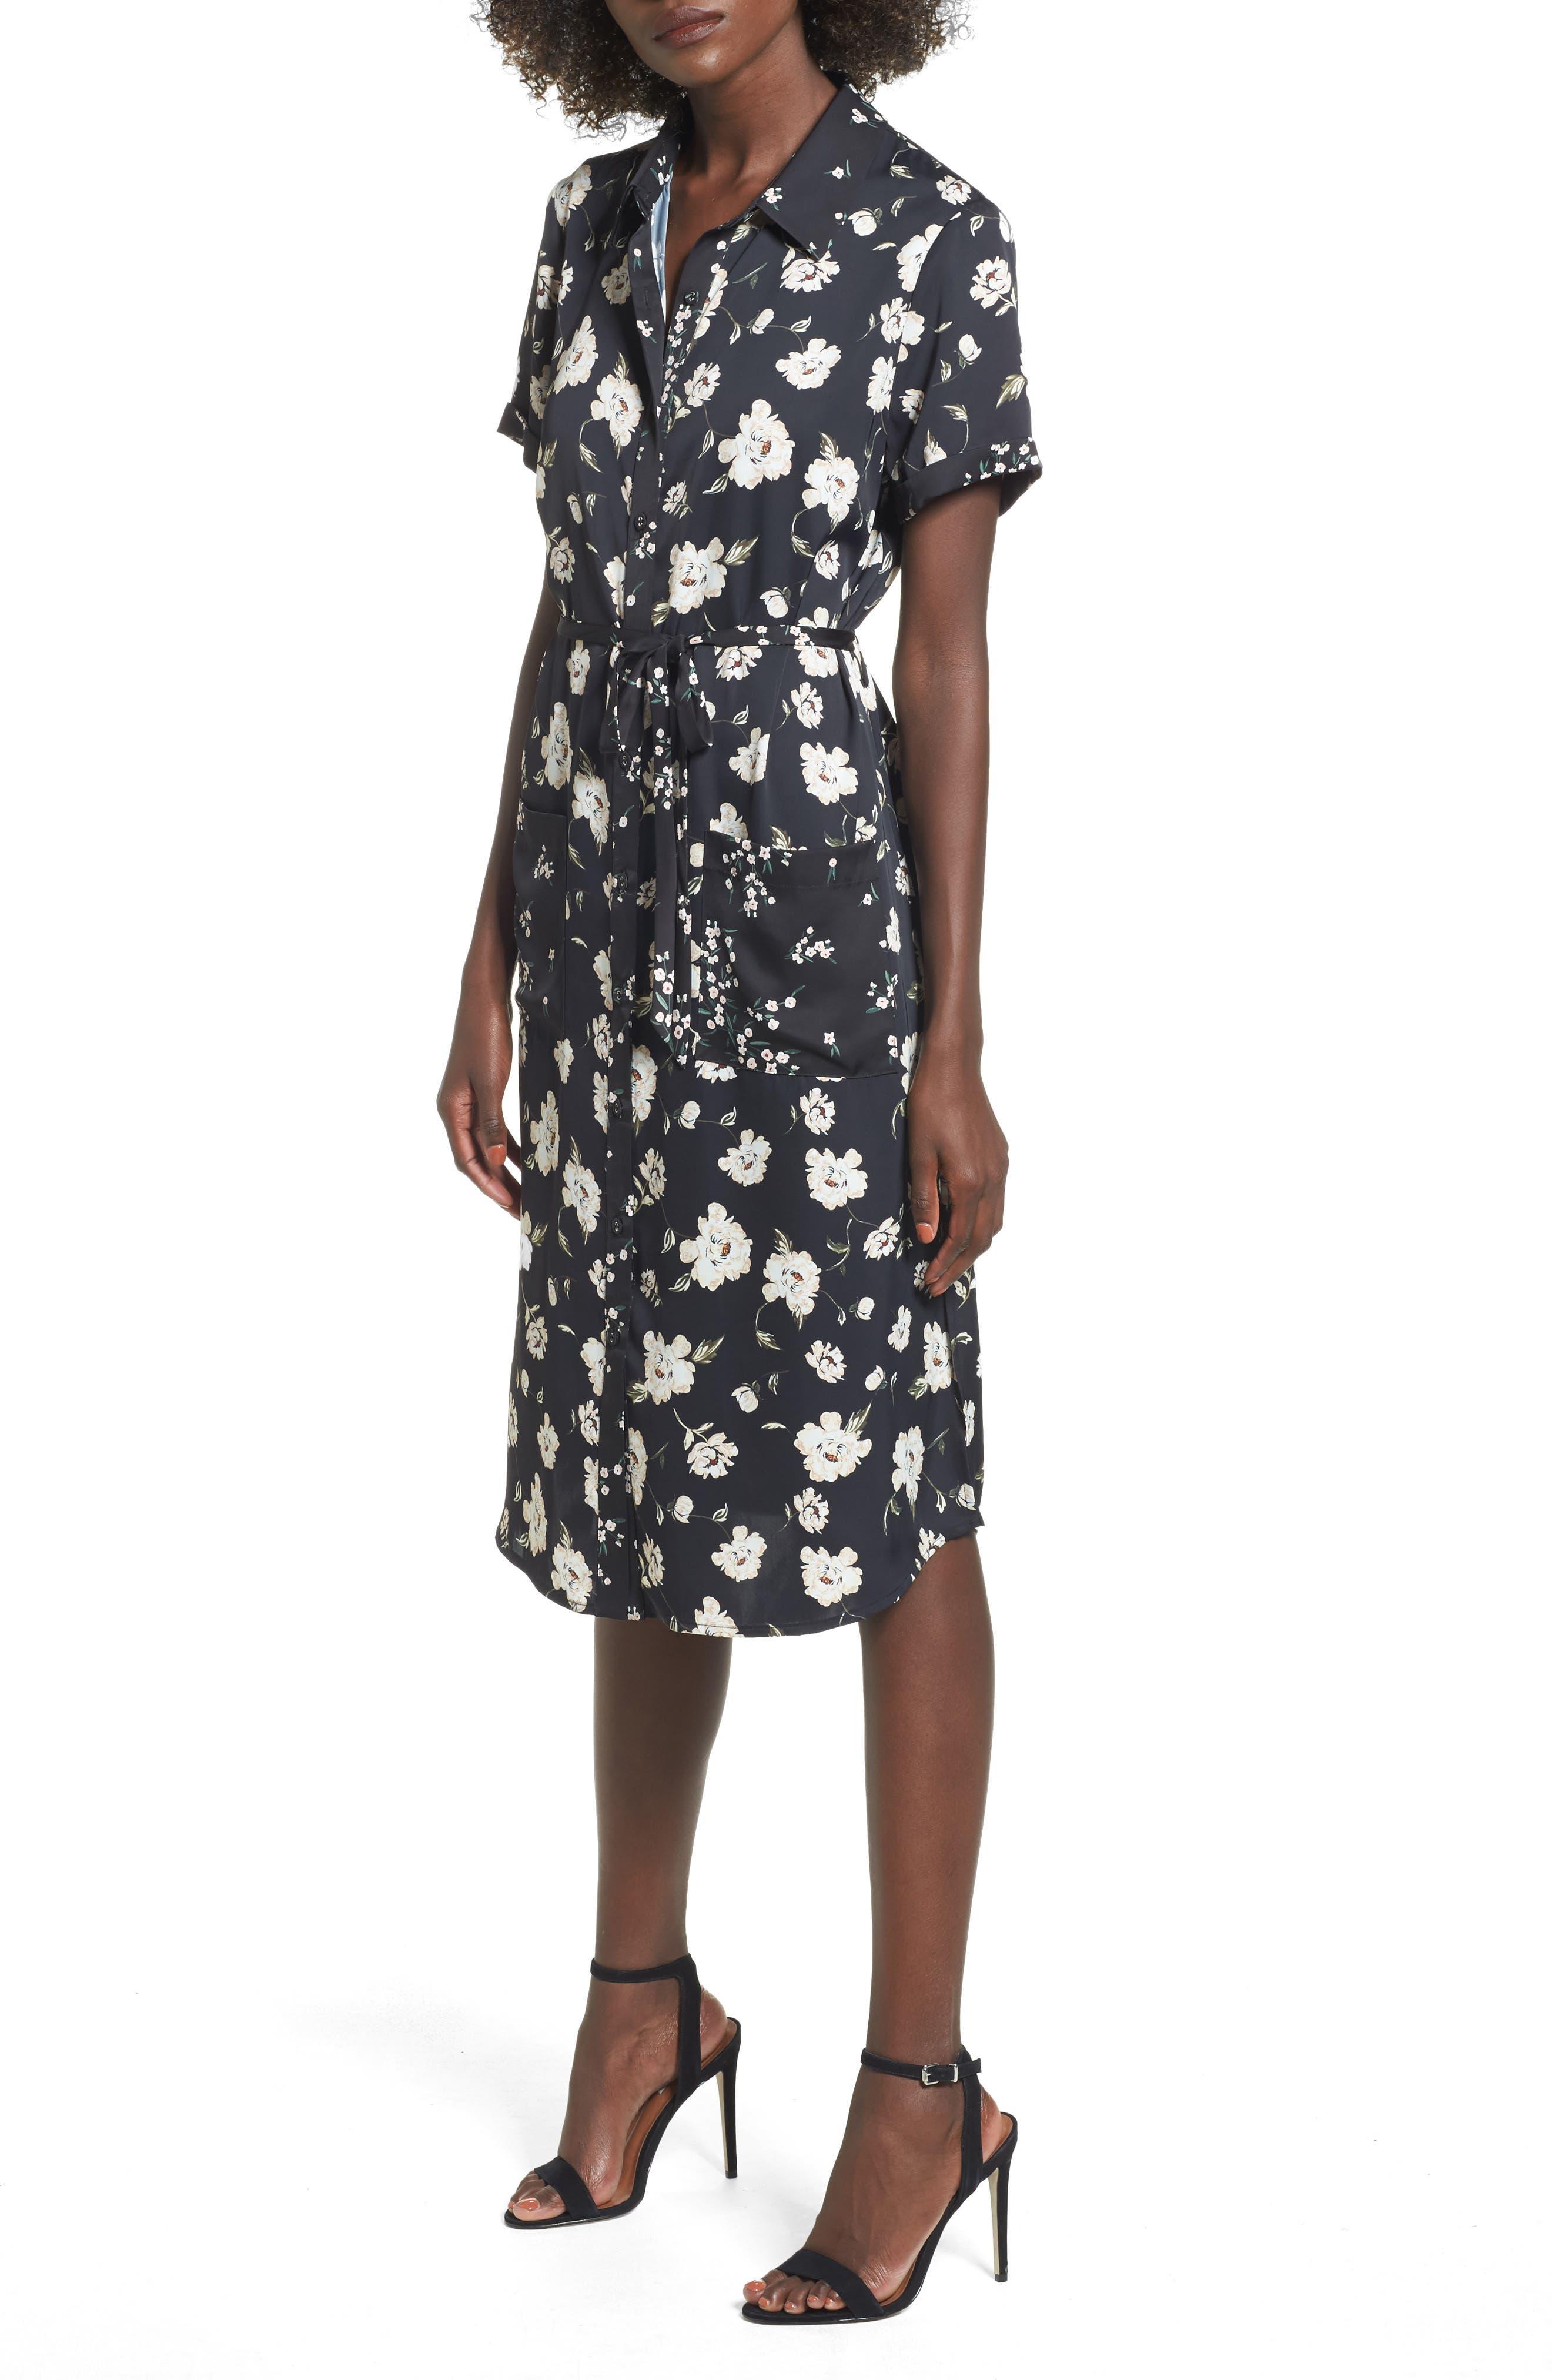 L'Academie The Shirt Dress Midi Dress,                         Main,                         color, 001